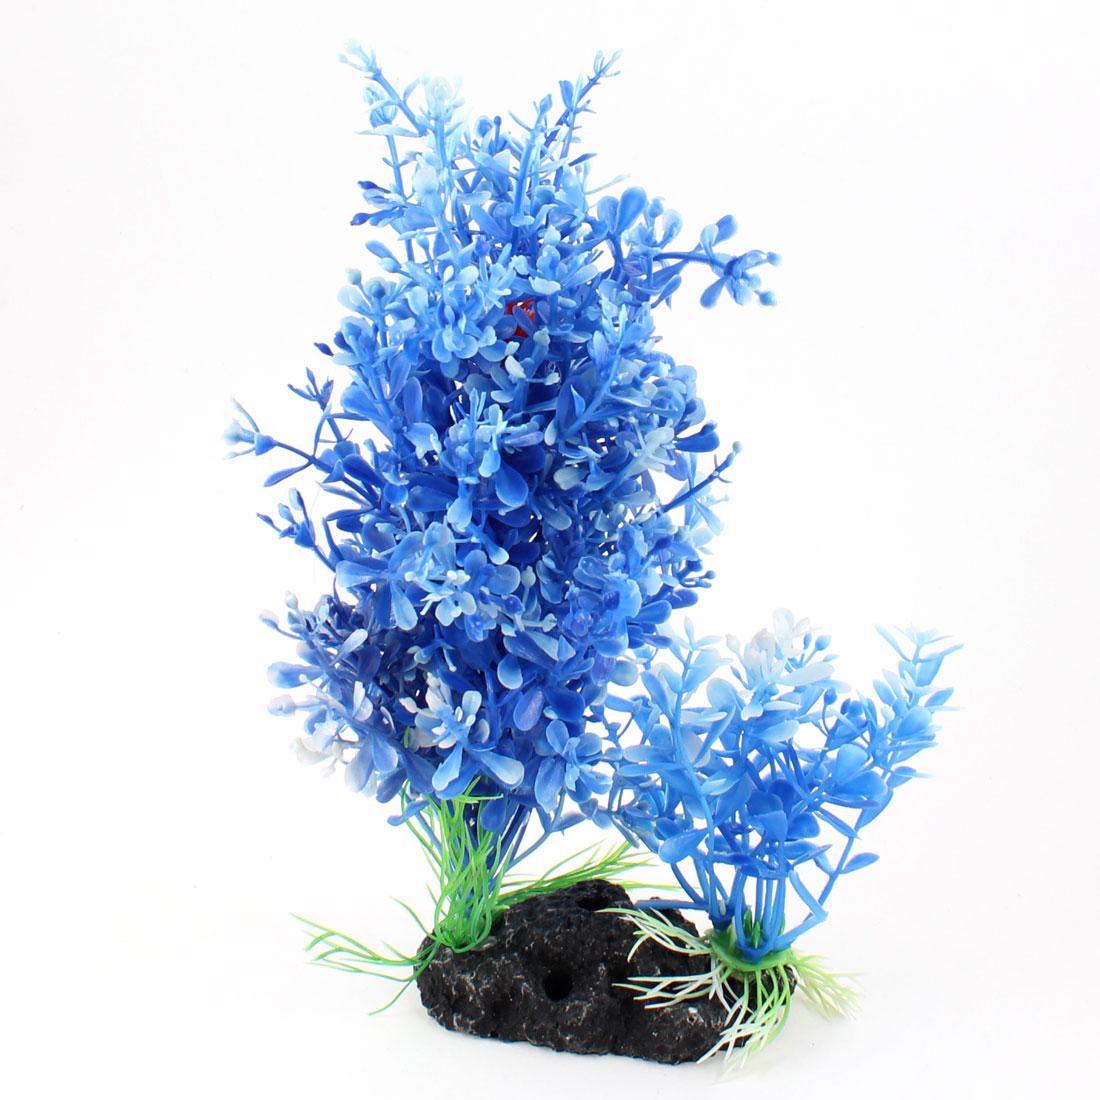 "Dodger Blue Underwater Plastic Grasses Plant 8.3"" Height Ornament"